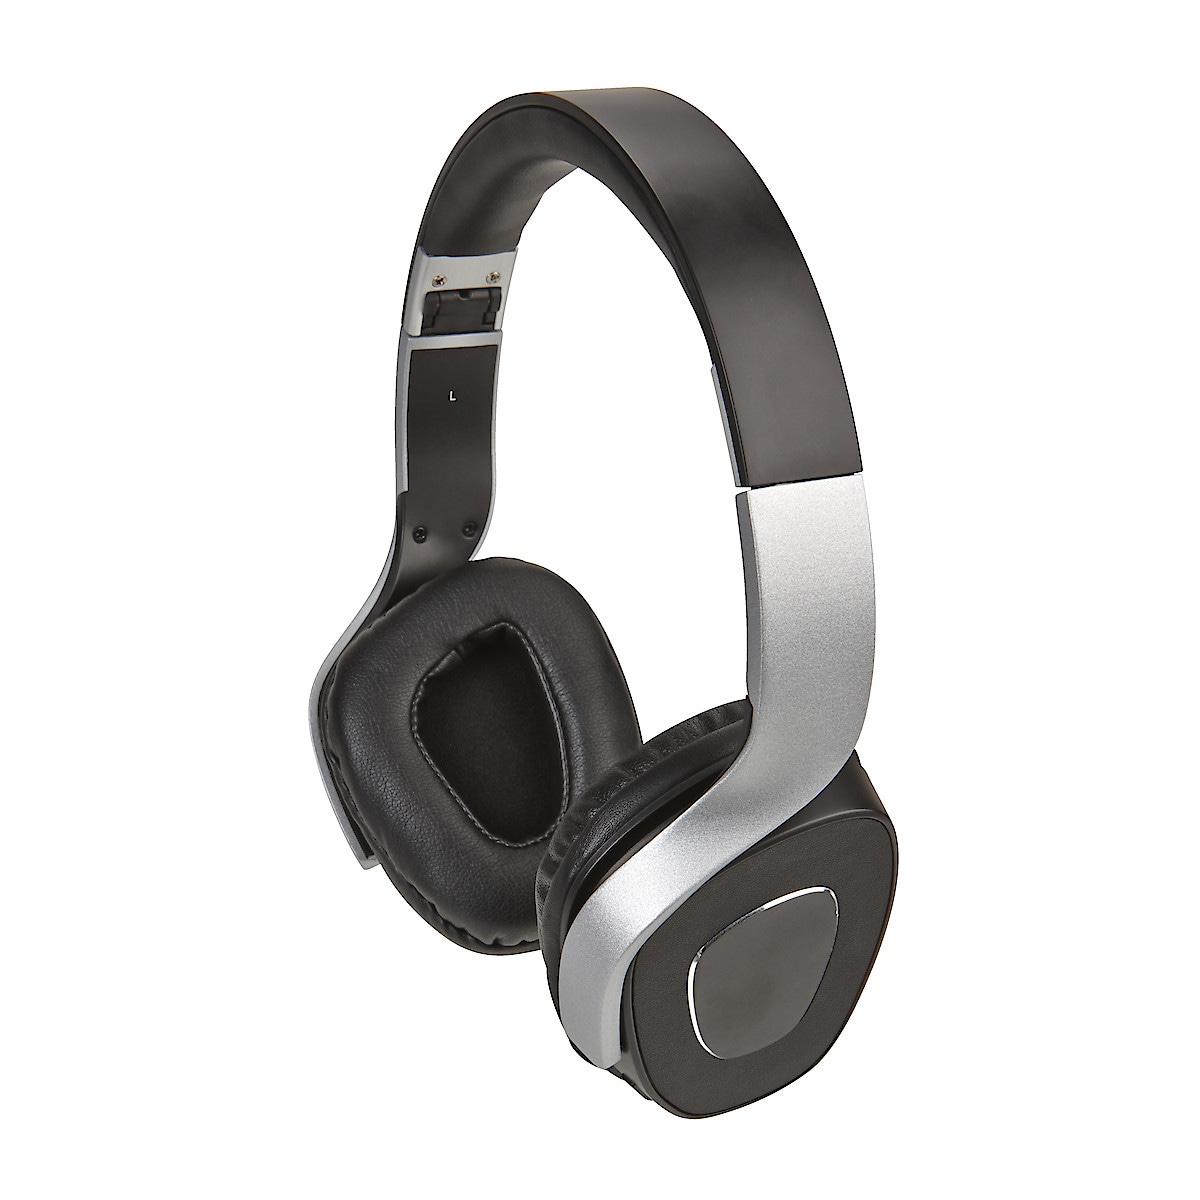 Wireless Headphones with Microphone